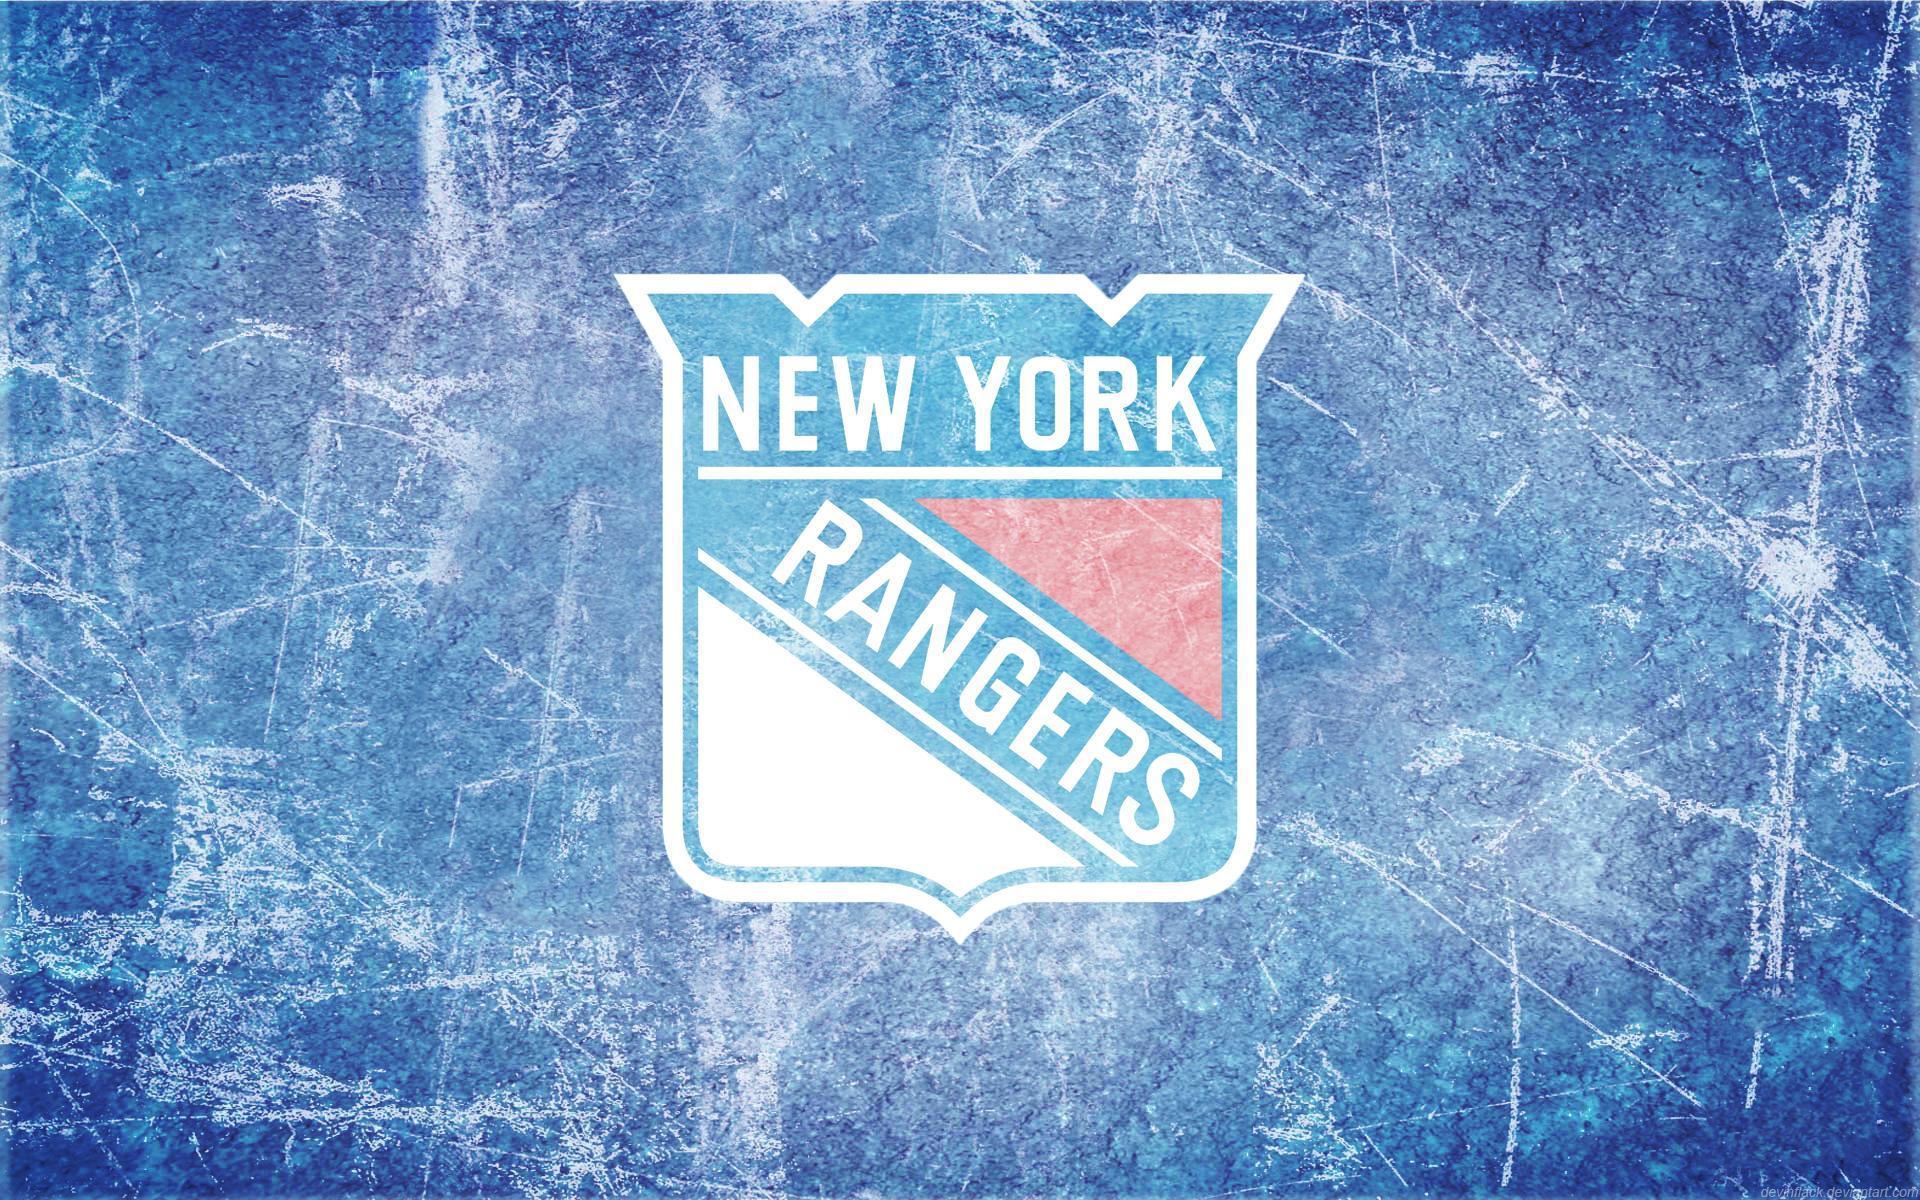 NY Rangers Backgrounds 1920x1200